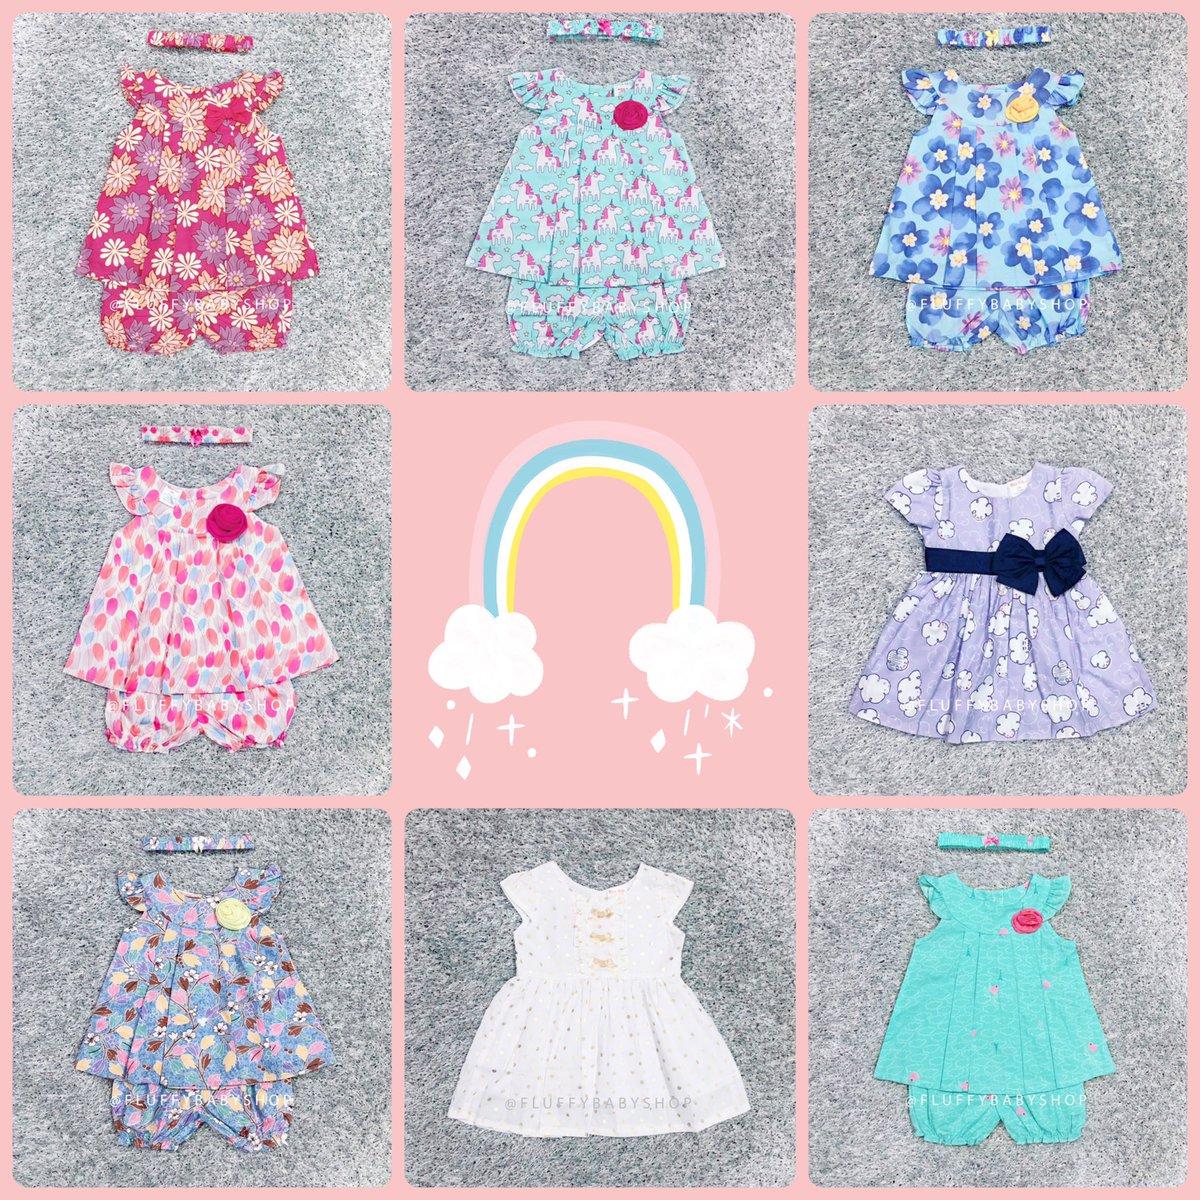 Image result for รูปเสื้อผ้าเด็ก